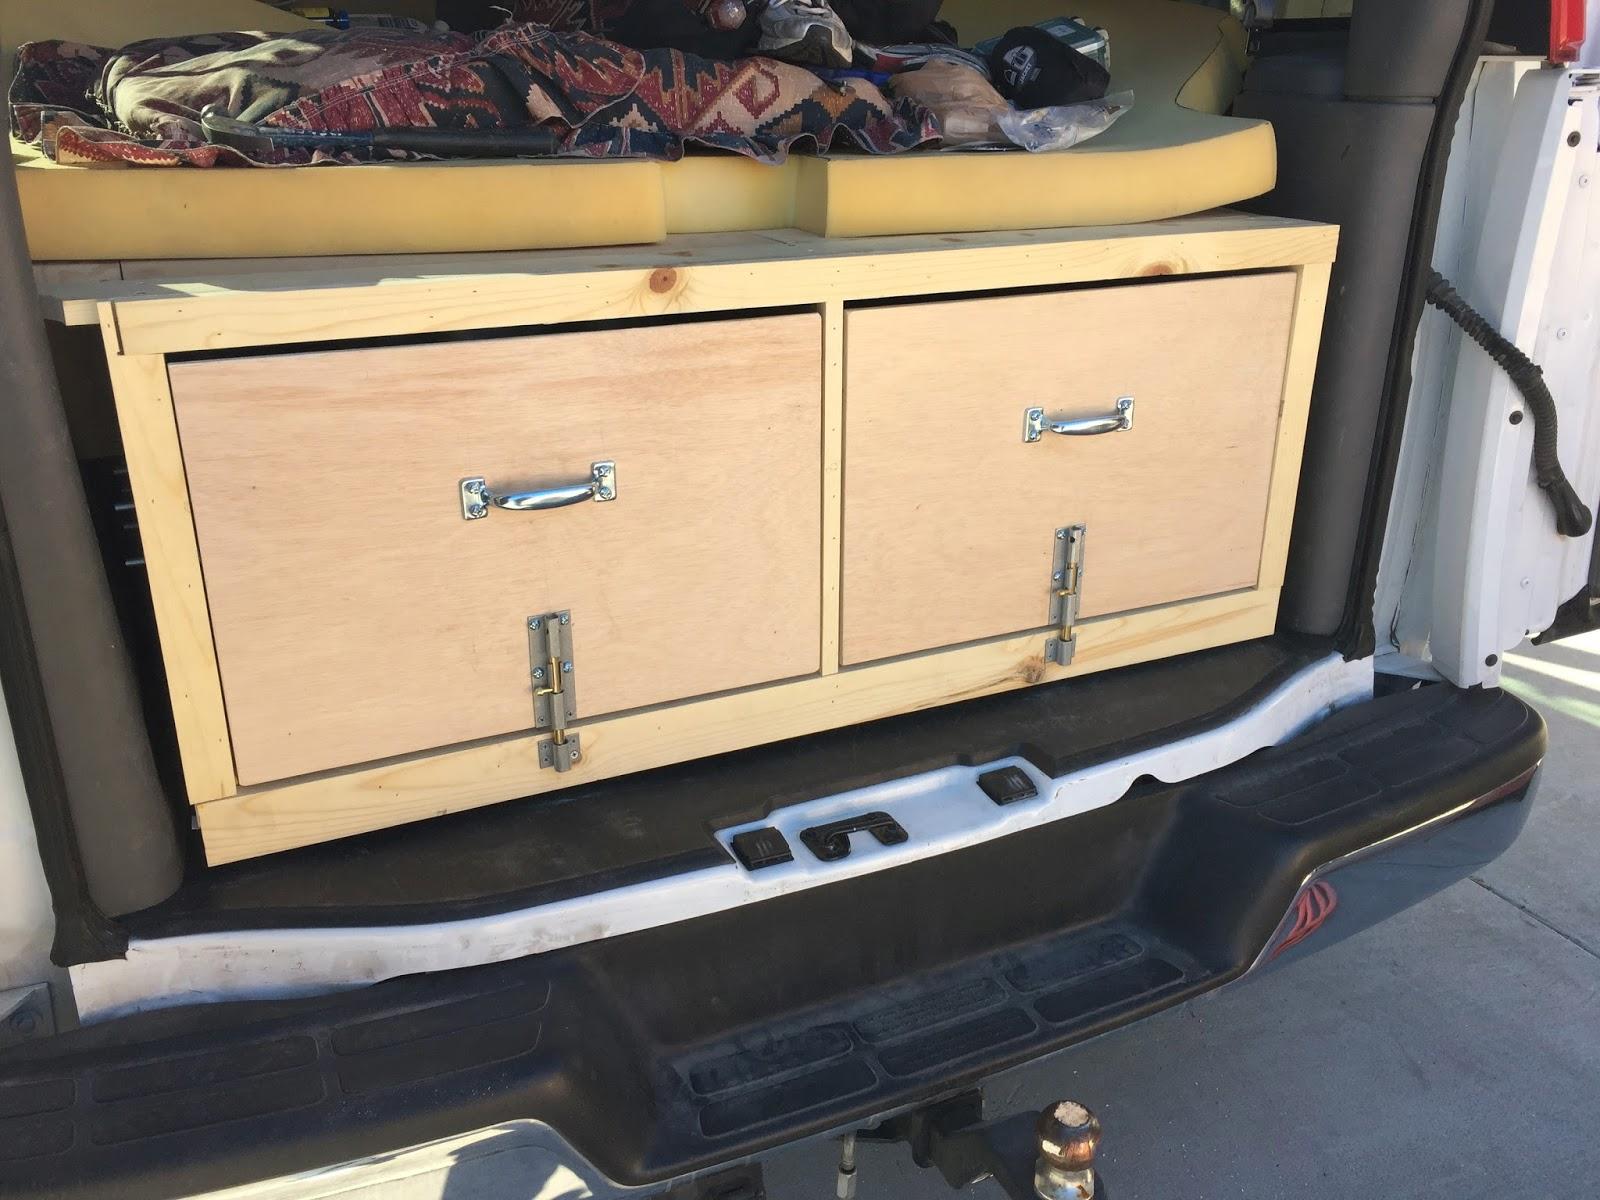 Toponautic Outdoor News Events Recipes Diy Chevy Van